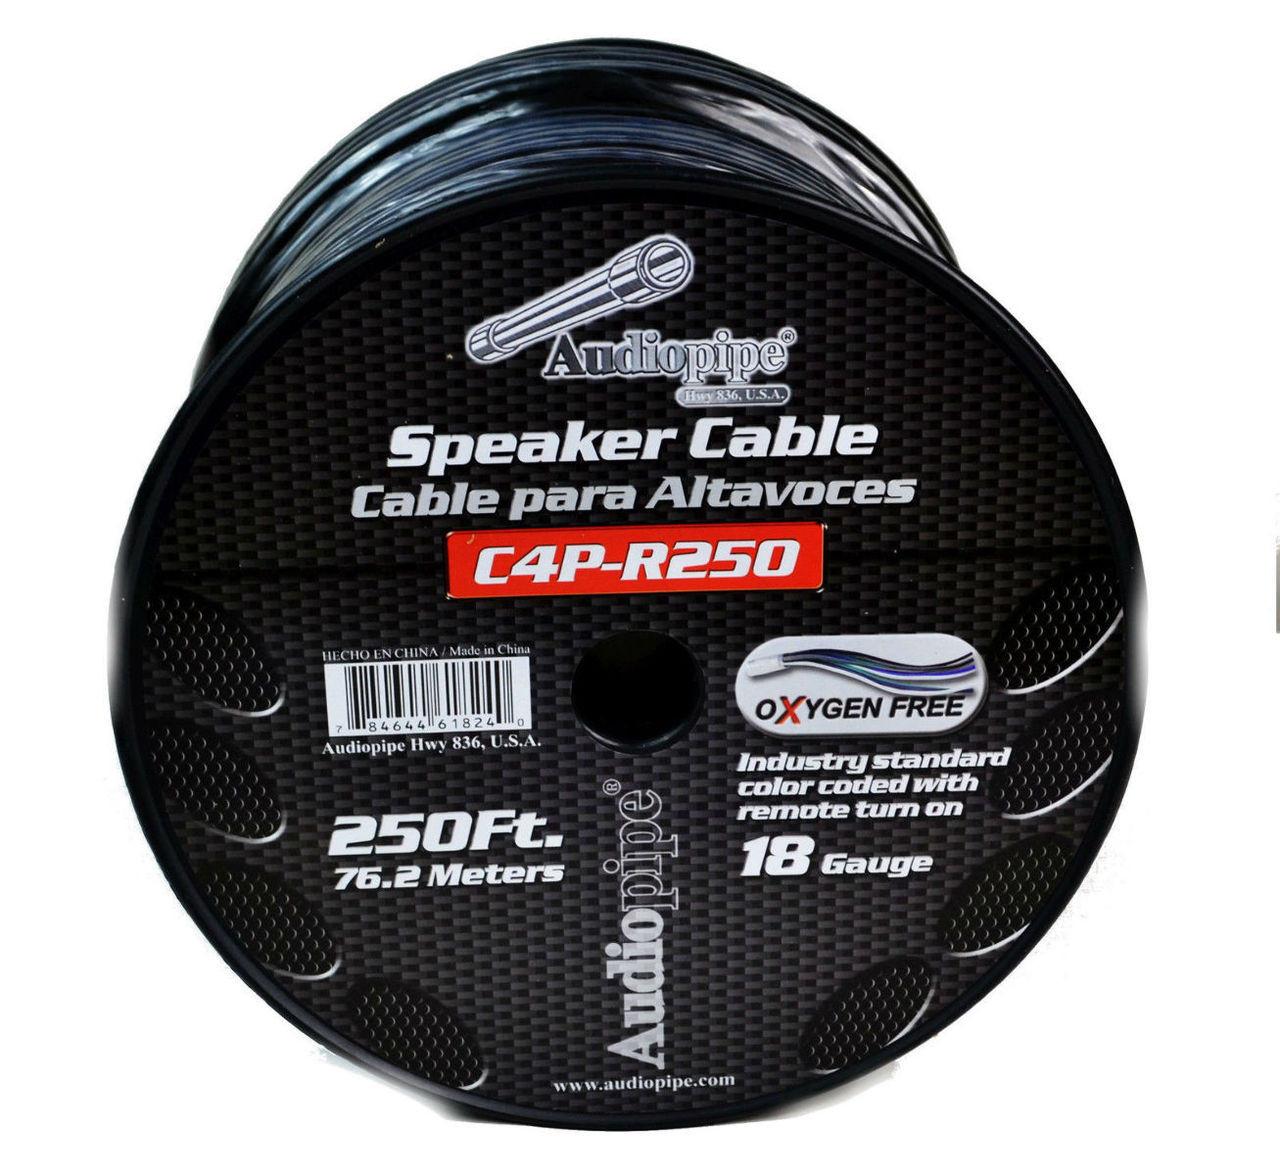 9 Conductor 18 Gauge 250 Feet Speed Cable Alarm Speaker